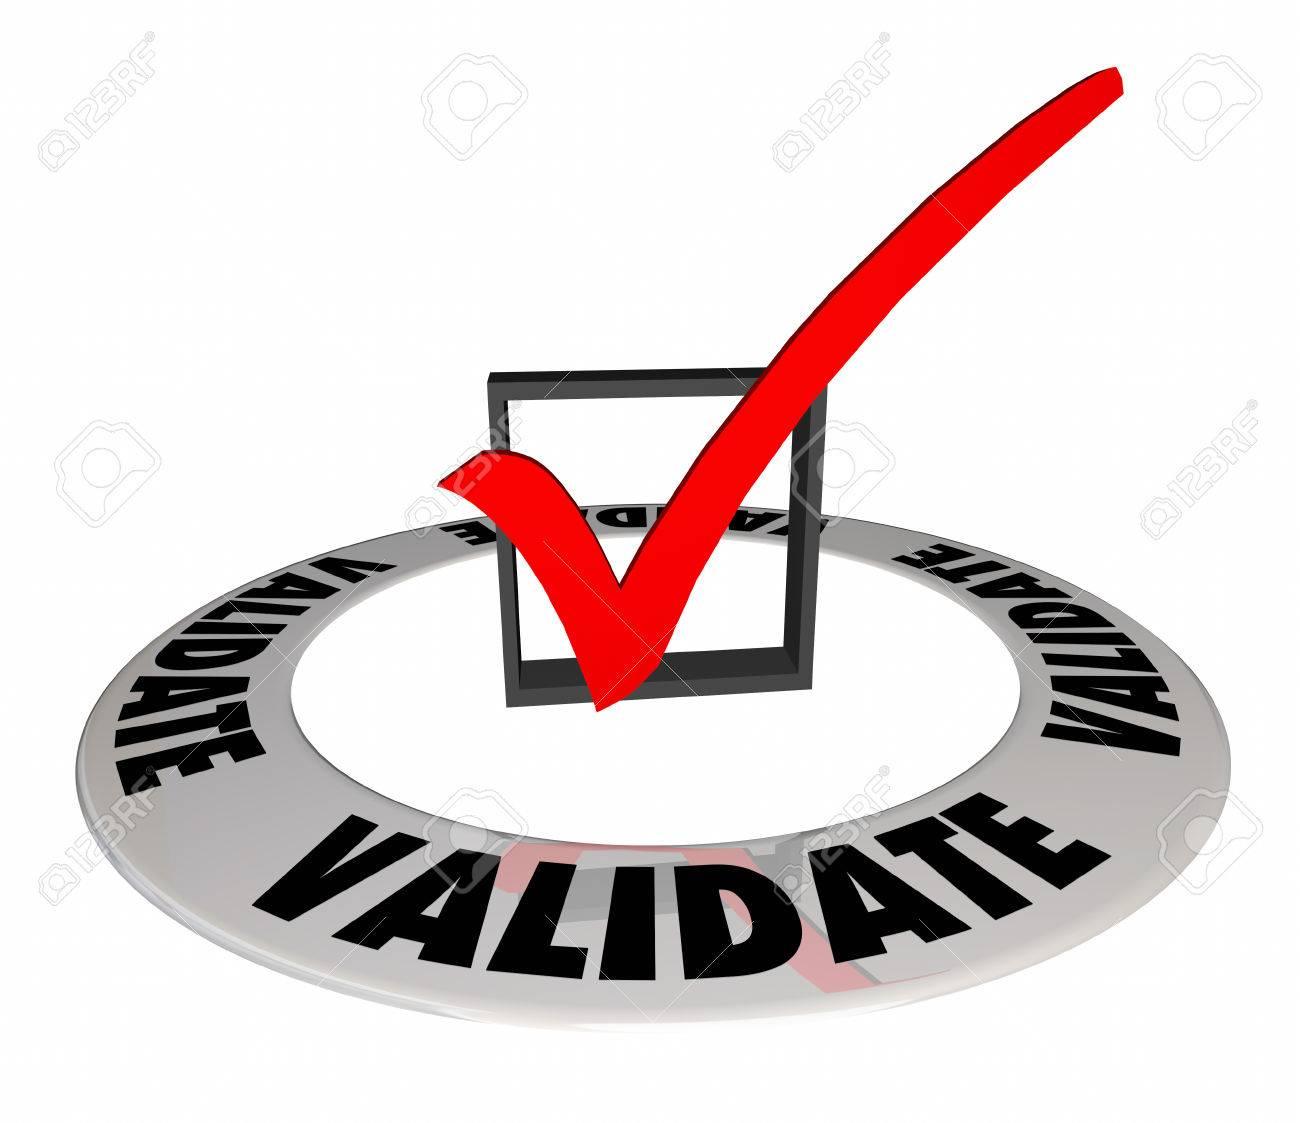 Validate Check Mark Box Confirm Verify Approve 3d Illustration - 78737264